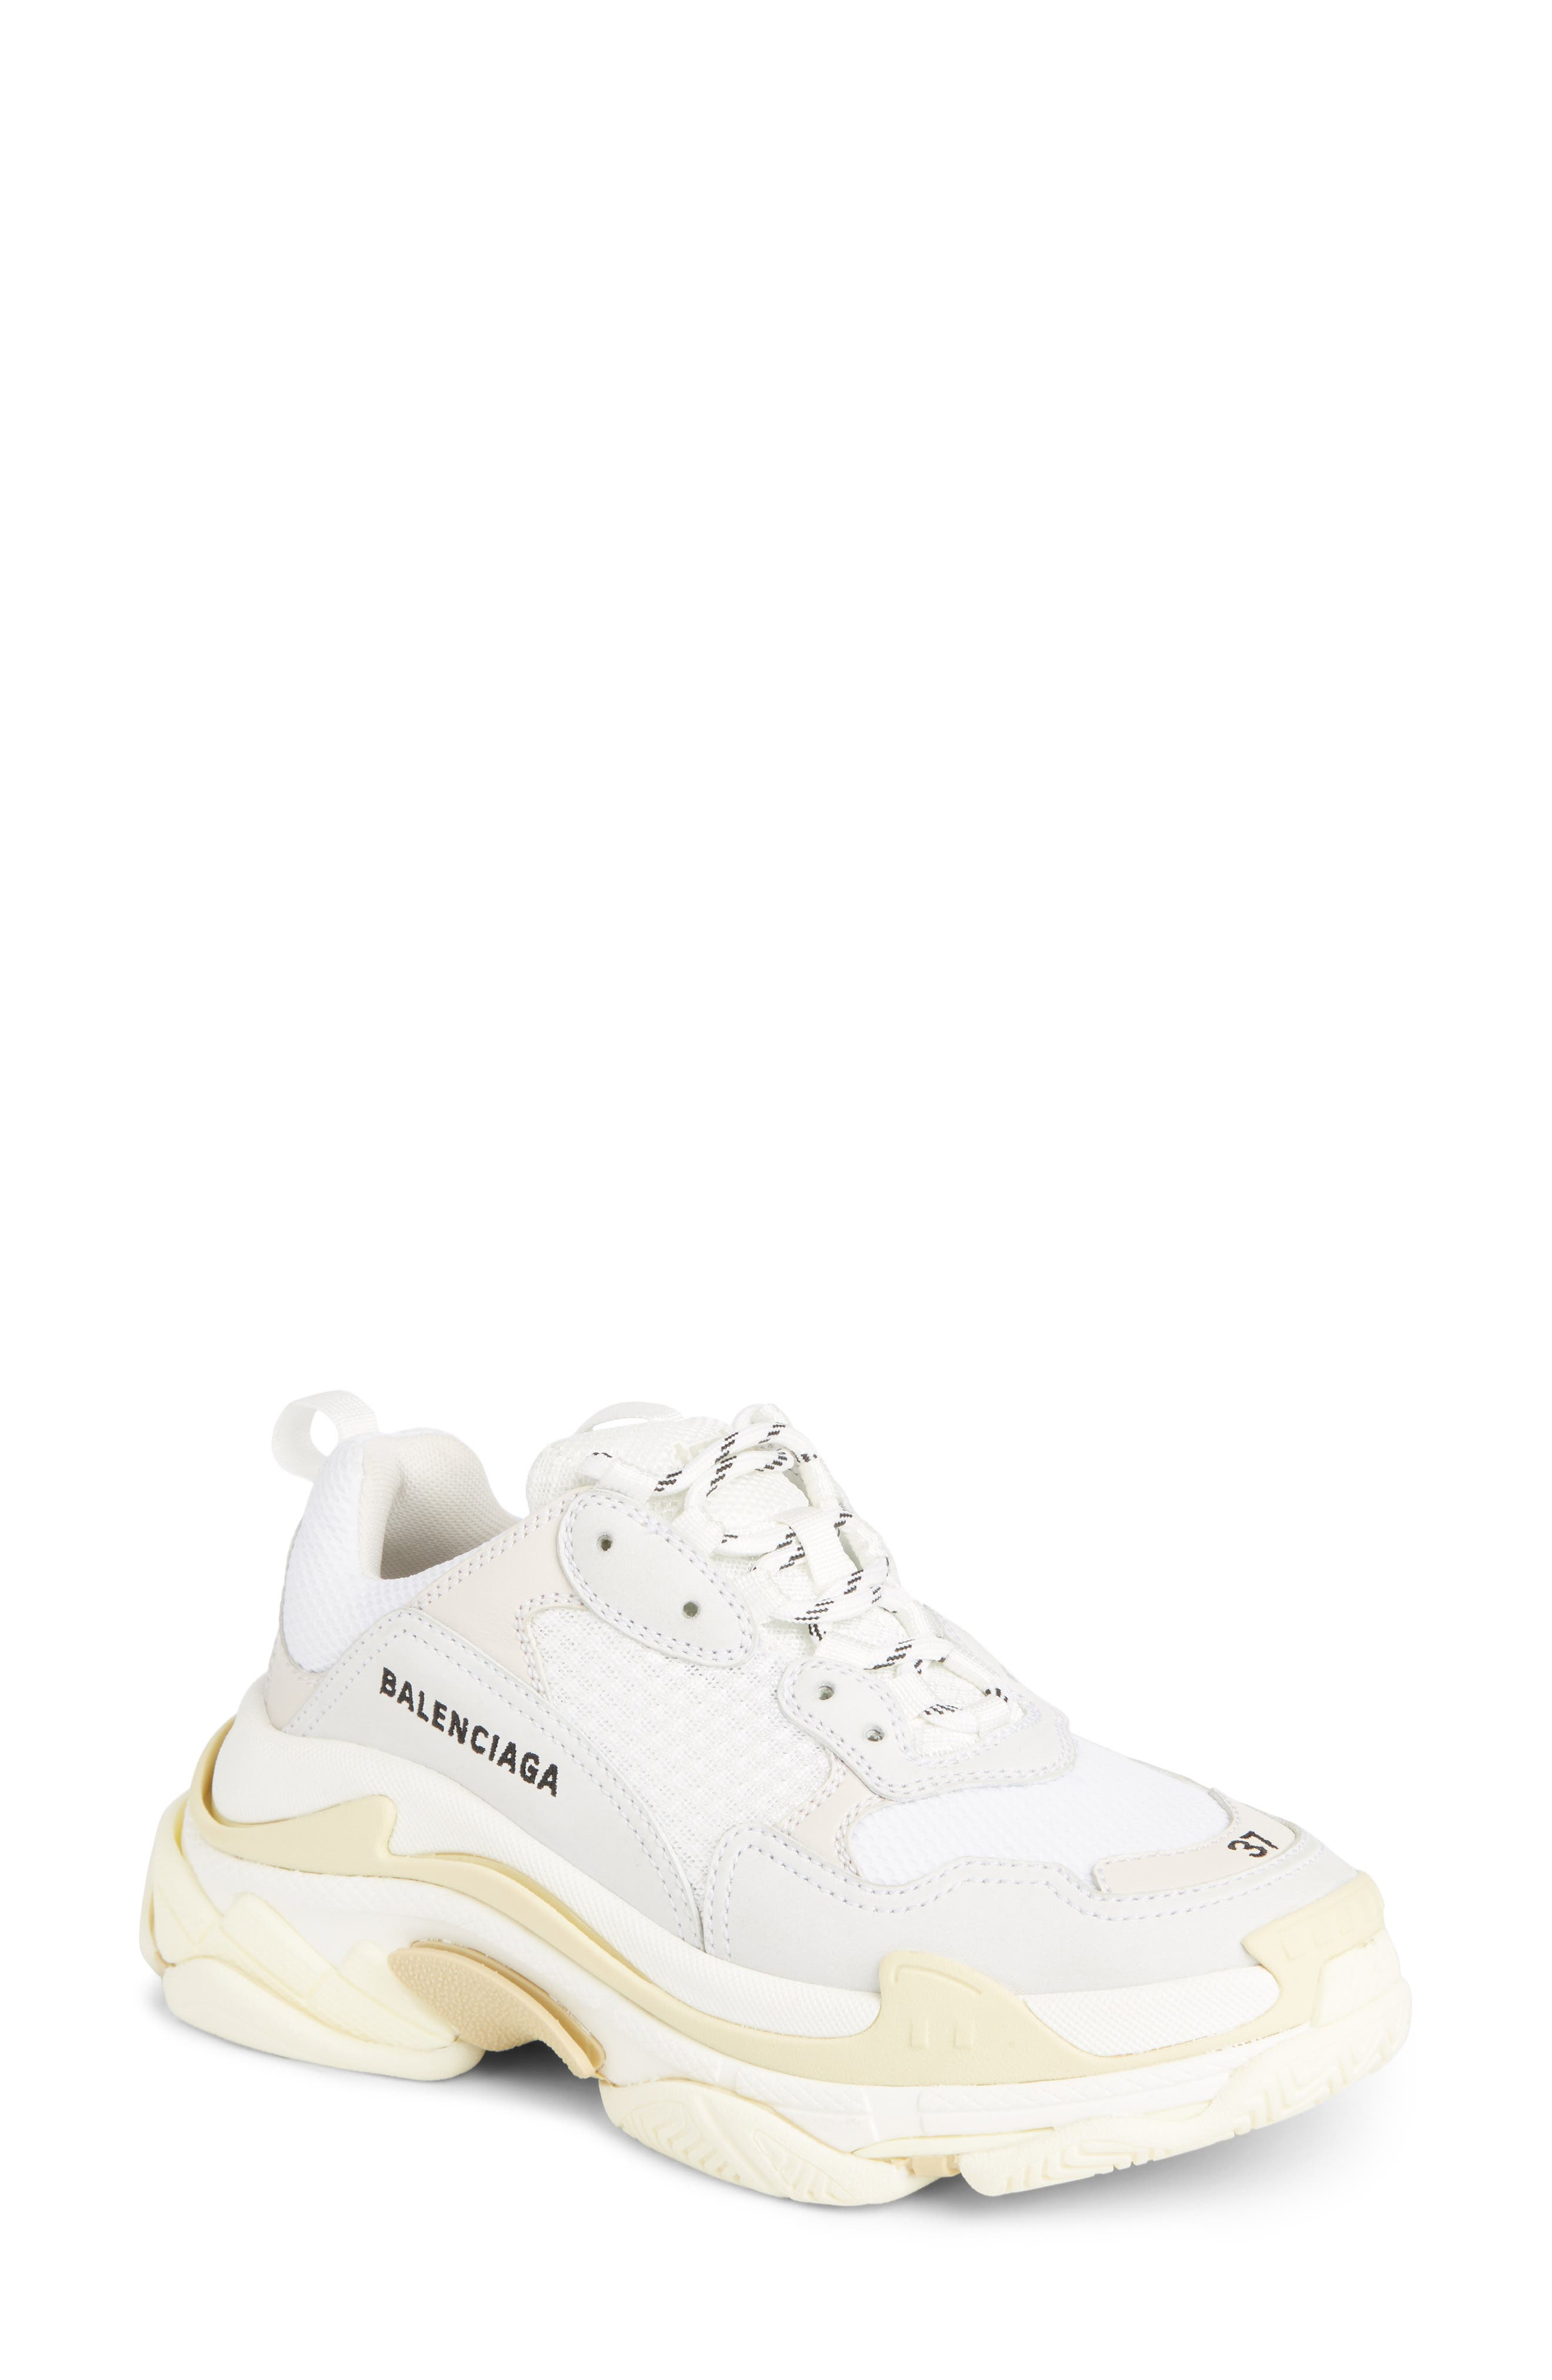 Triple S Low Top Sneaker,                         Main,                         color, WHITE/ CREAM